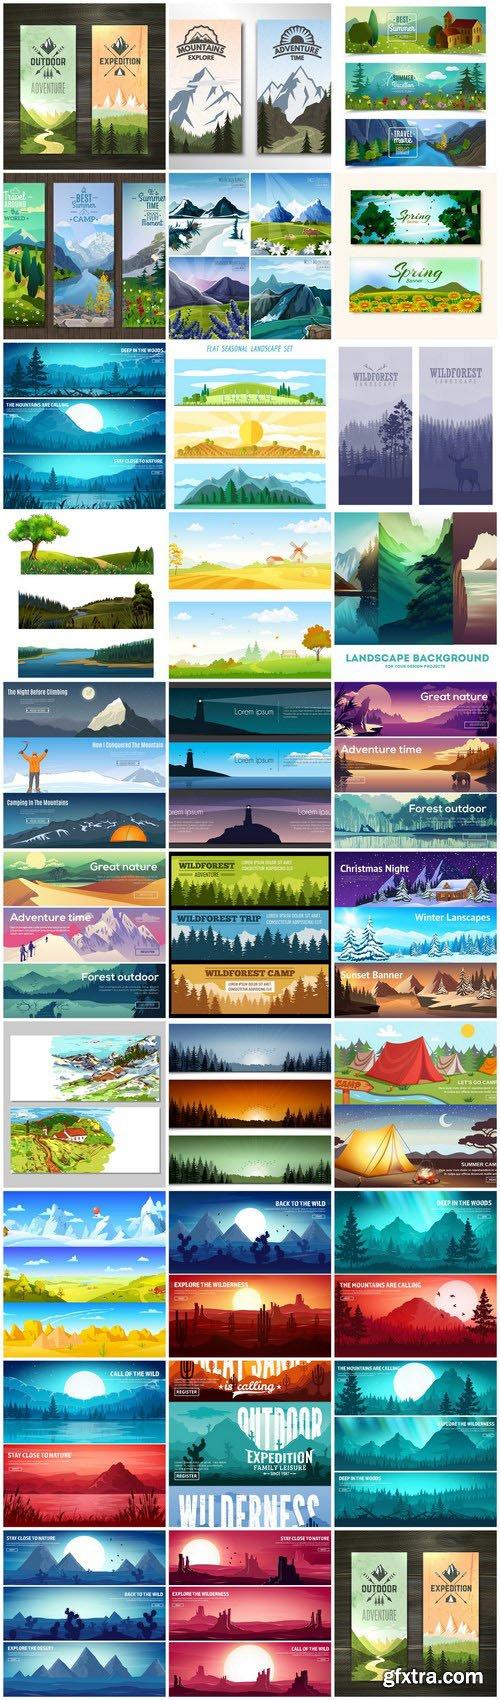 Nature Landscape Banners - 30 Vector